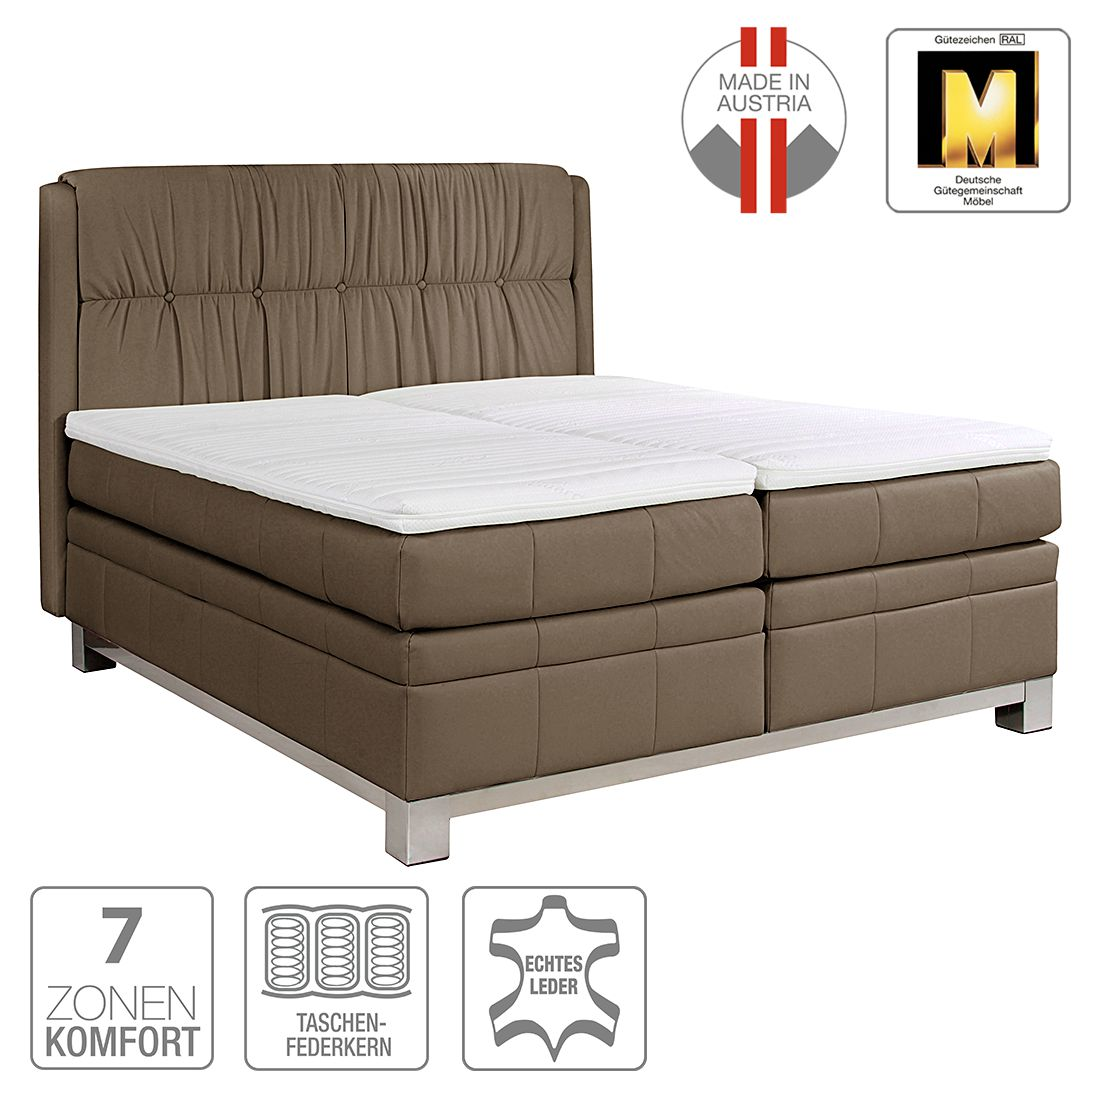 boxspringbett wolke7 ii echtleder 160 x 200cm h3 ab 80 kg braun ada premium g nstig. Black Bedroom Furniture Sets. Home Design Ideas